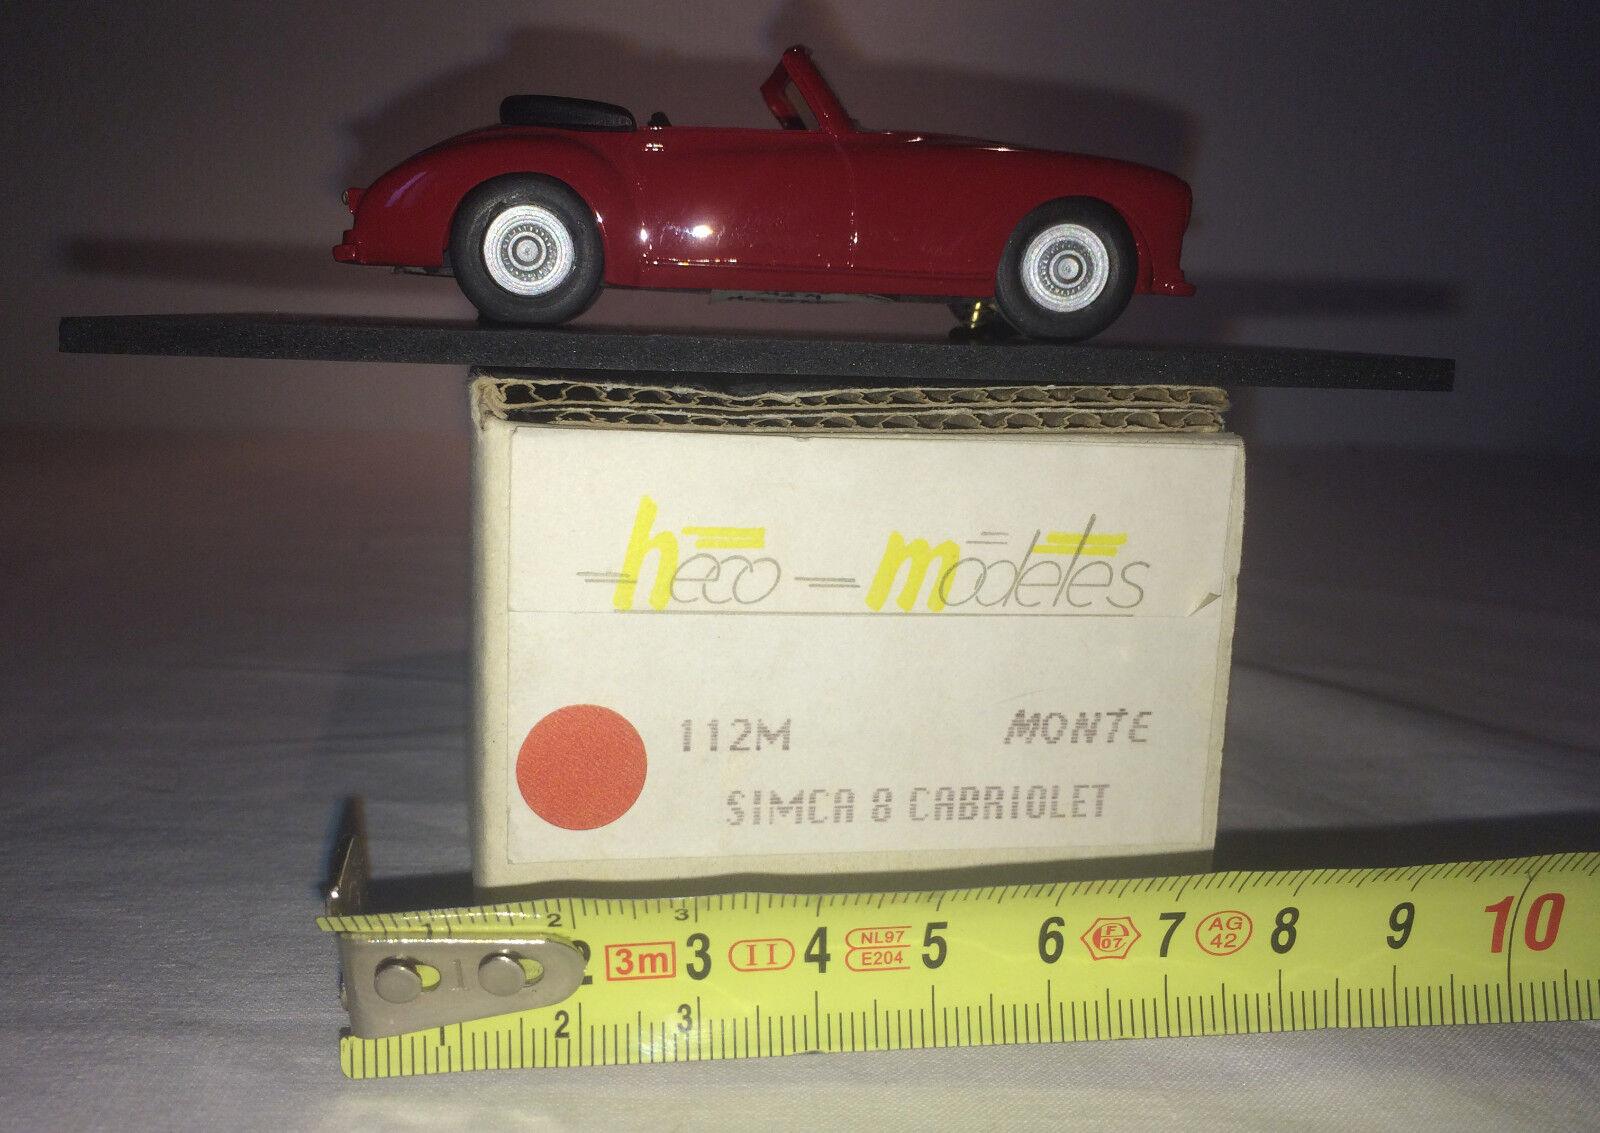 Heco Modeles Simca 8 Cabriolet monté d'origine réf 112M 1/43 résine